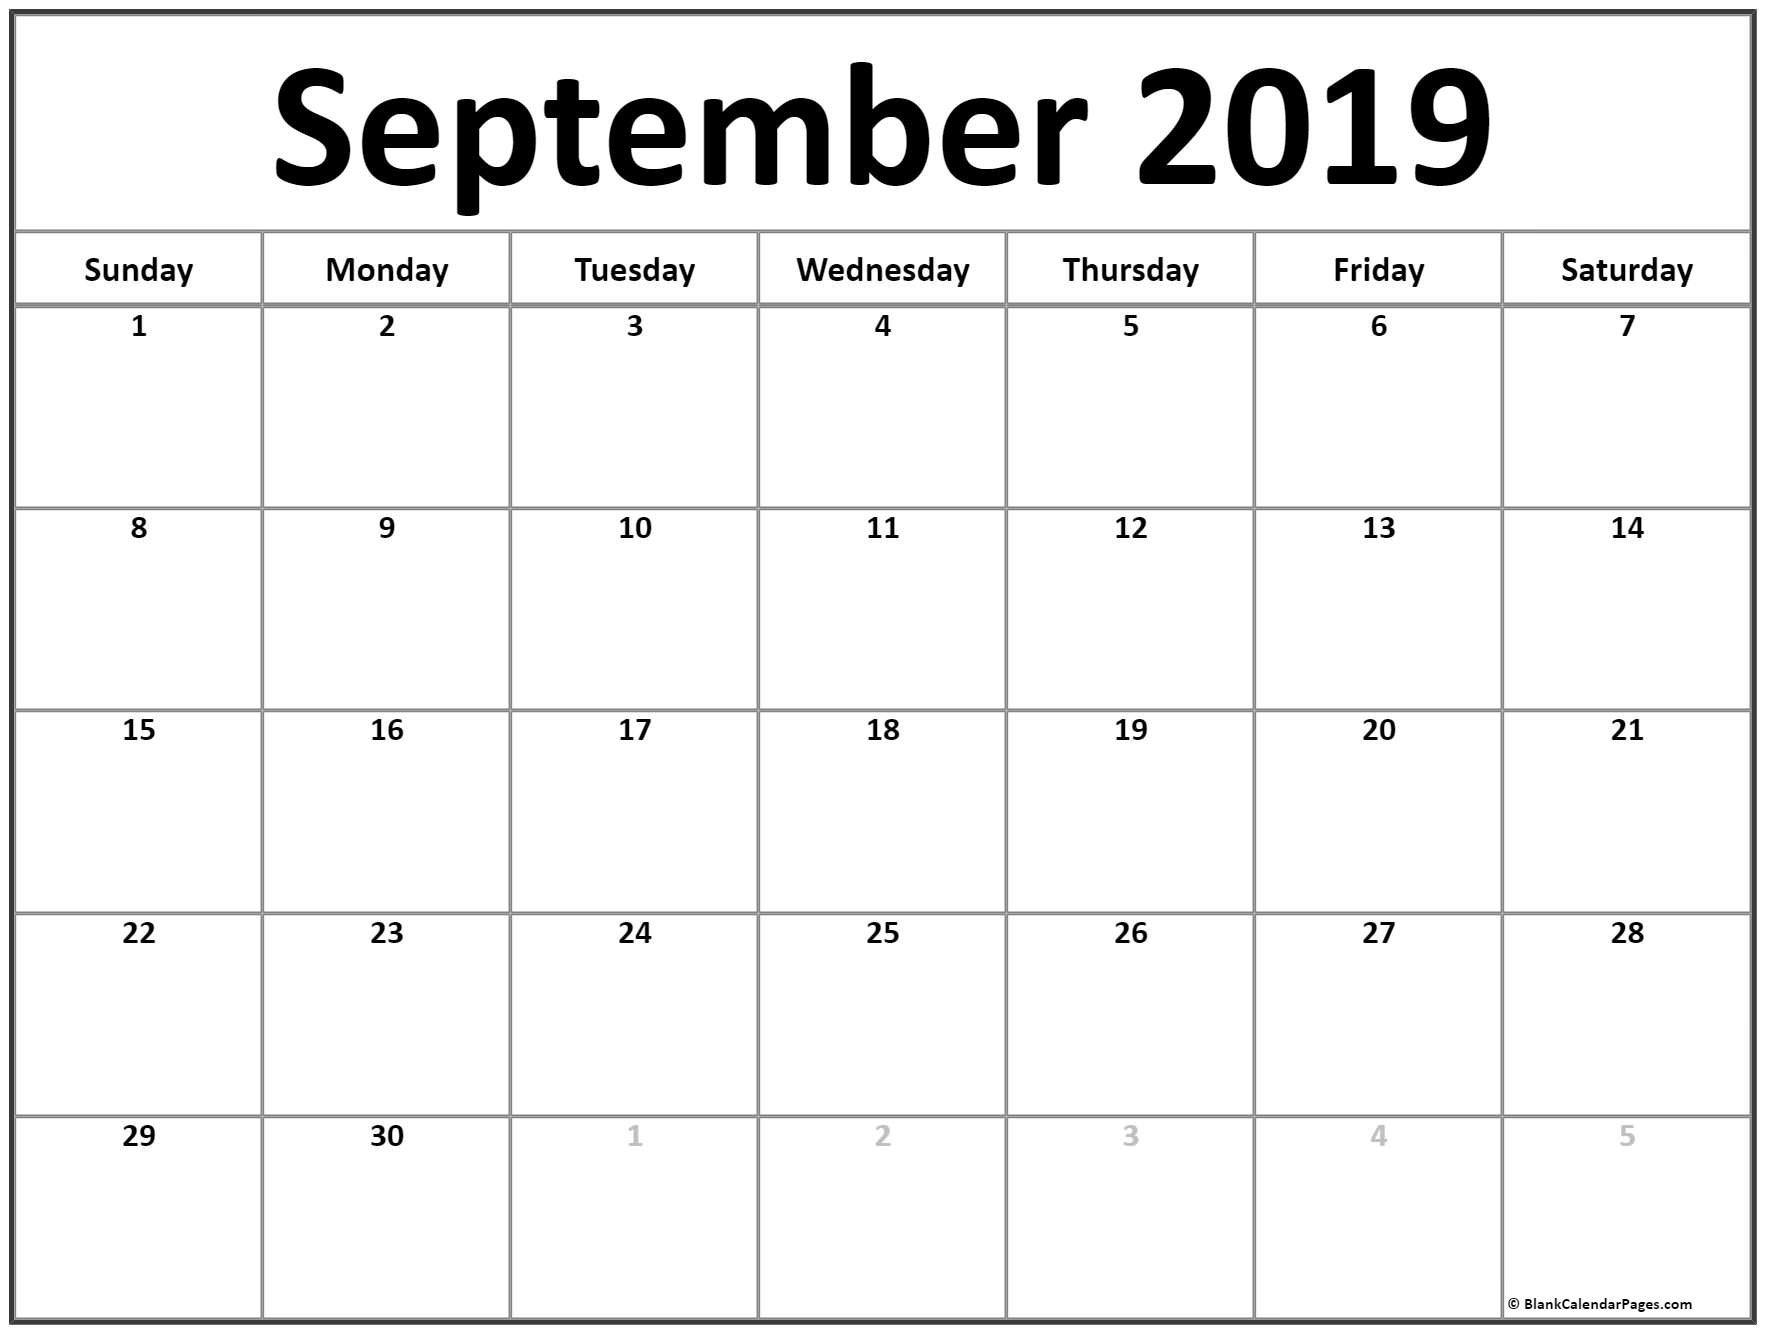 September 2019 Calendar | 56+ Templates Of 2019 Printable Calendars Calendar Of 2019 September